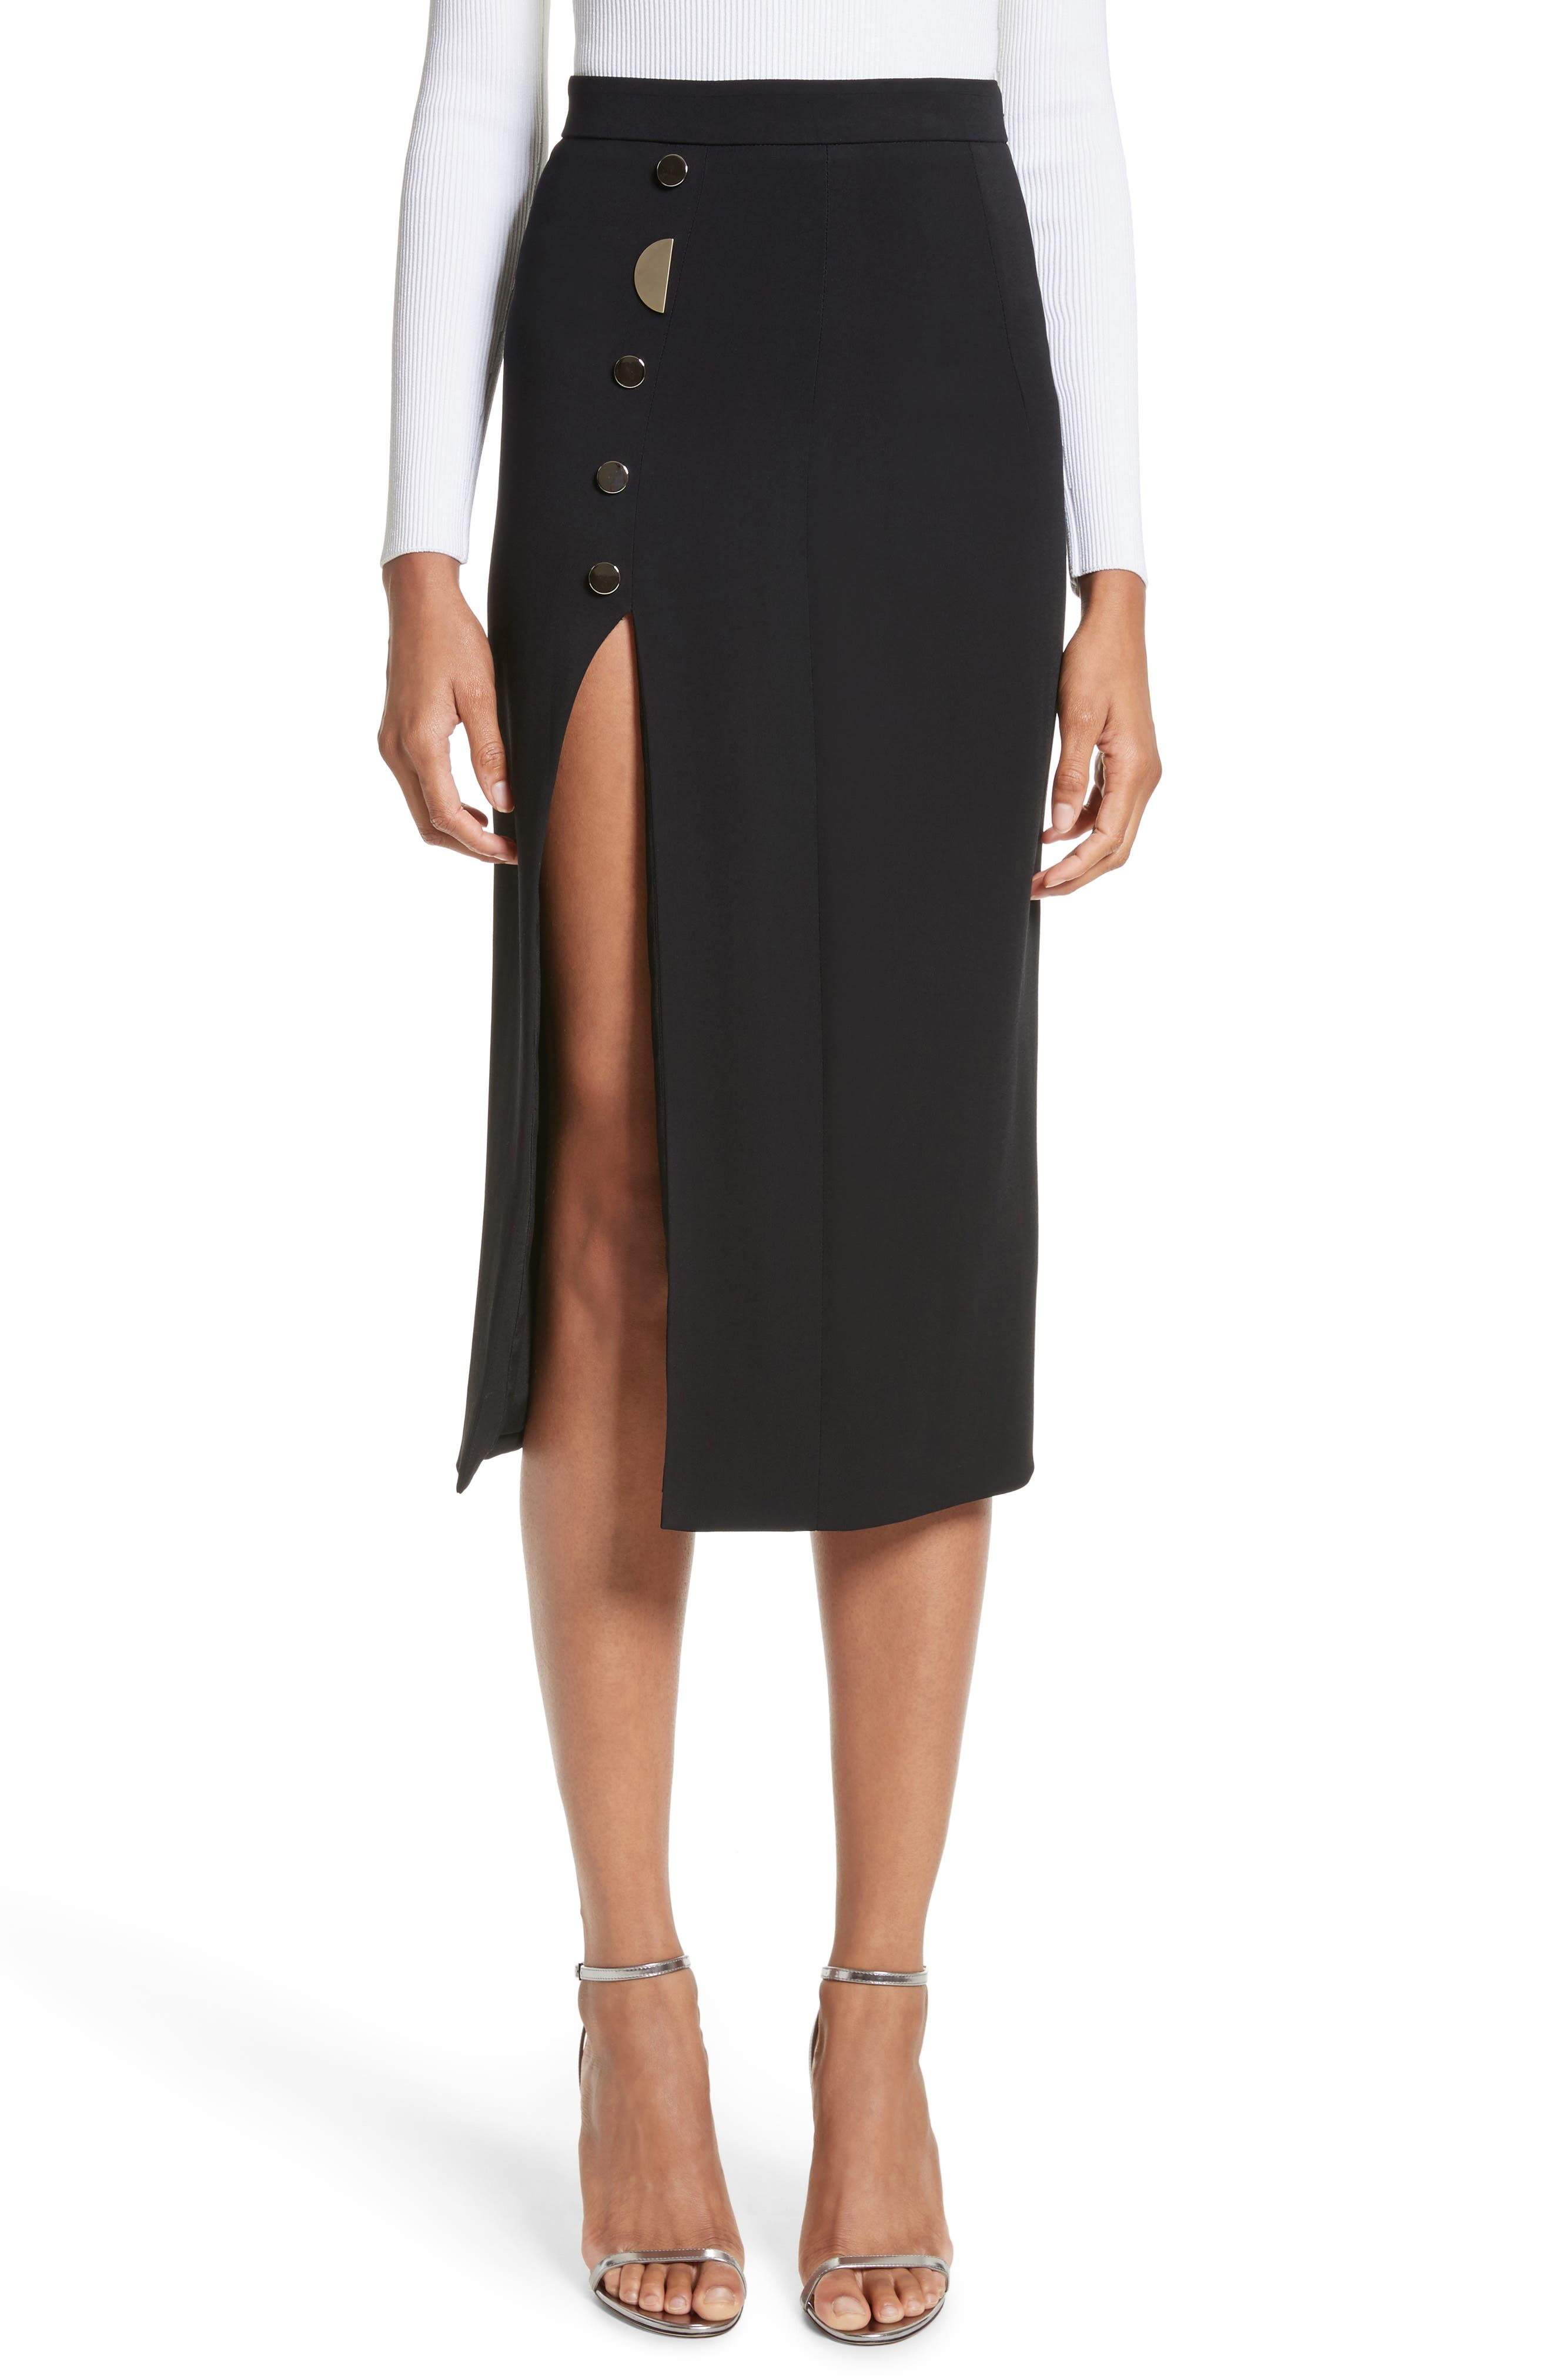 Cushnie et Ochs Dahlia Stretch Crepe Pencil Skirt